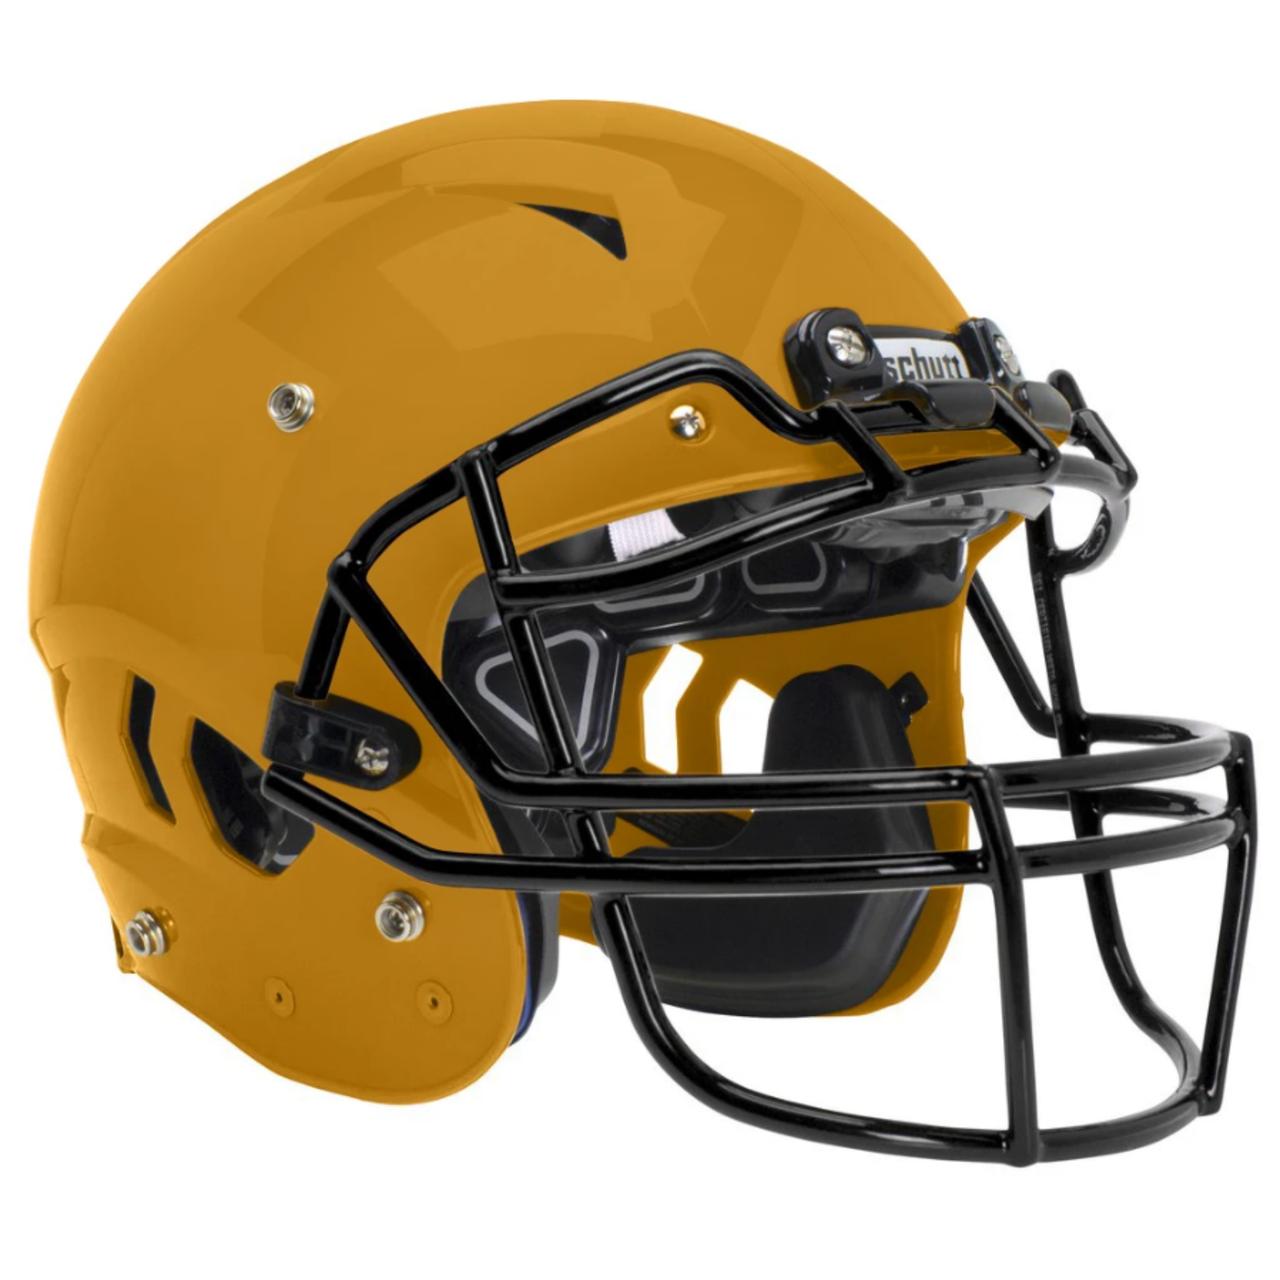 NEW Schutt Adult Vengeance Football Helmet Facemask Fits Any Vengeance Helmet